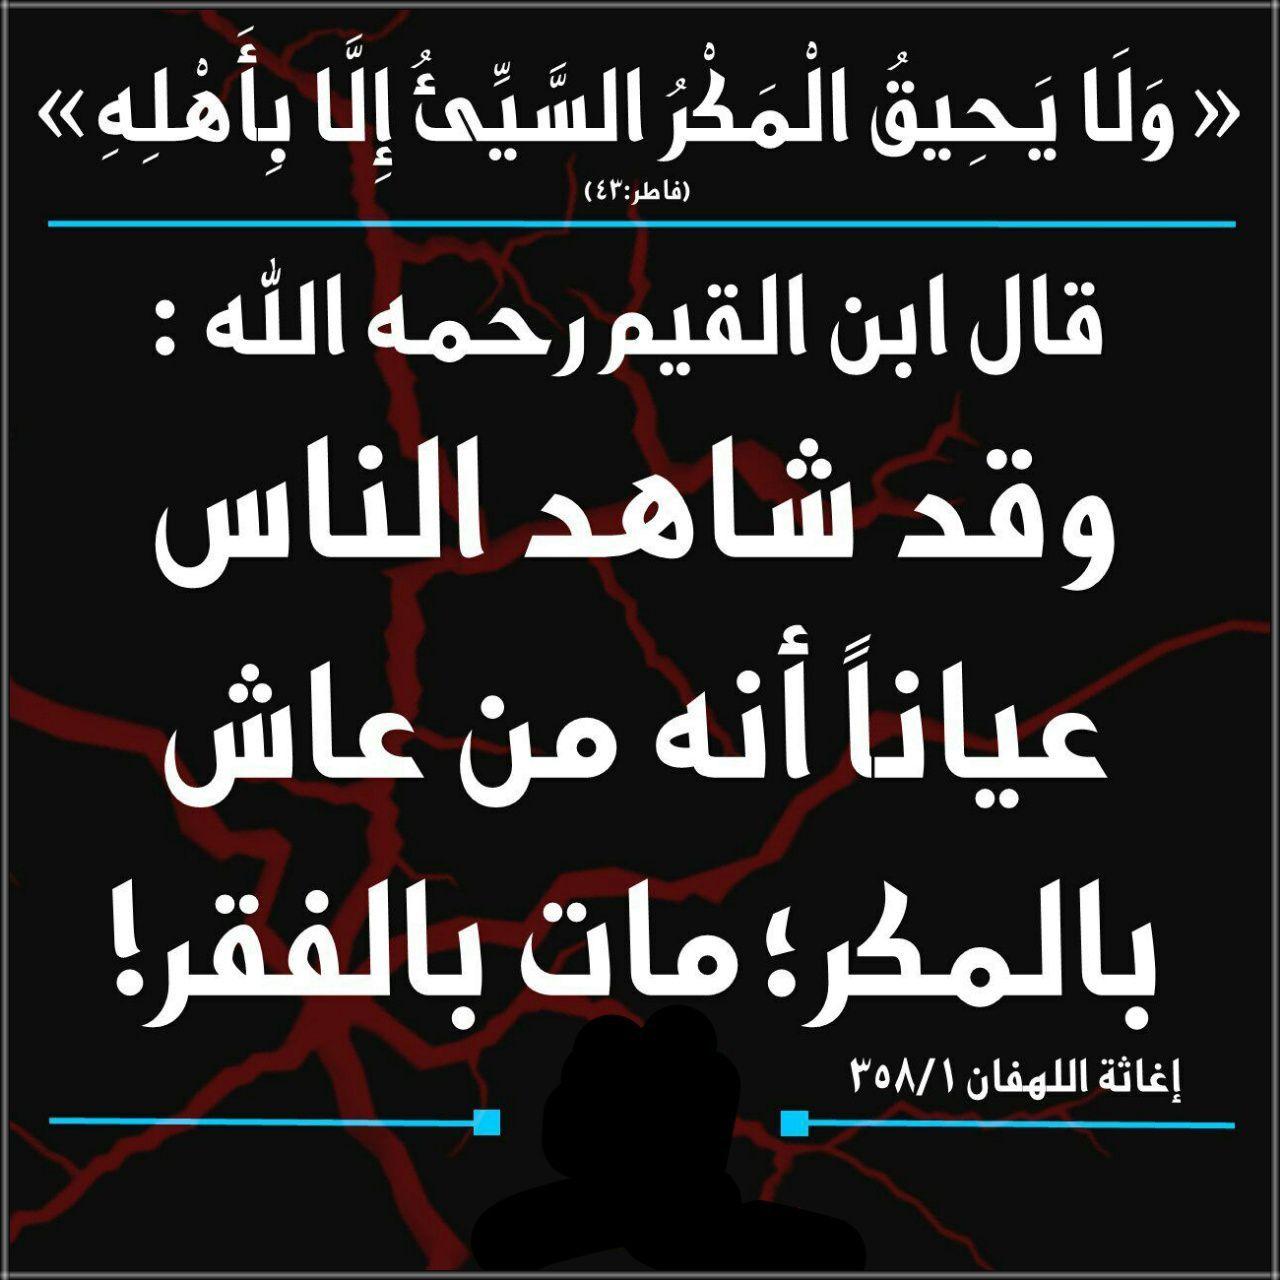 Pin By Mas On أقوال الصحابة والعلماء Quotes Wisdom Calm Artwork